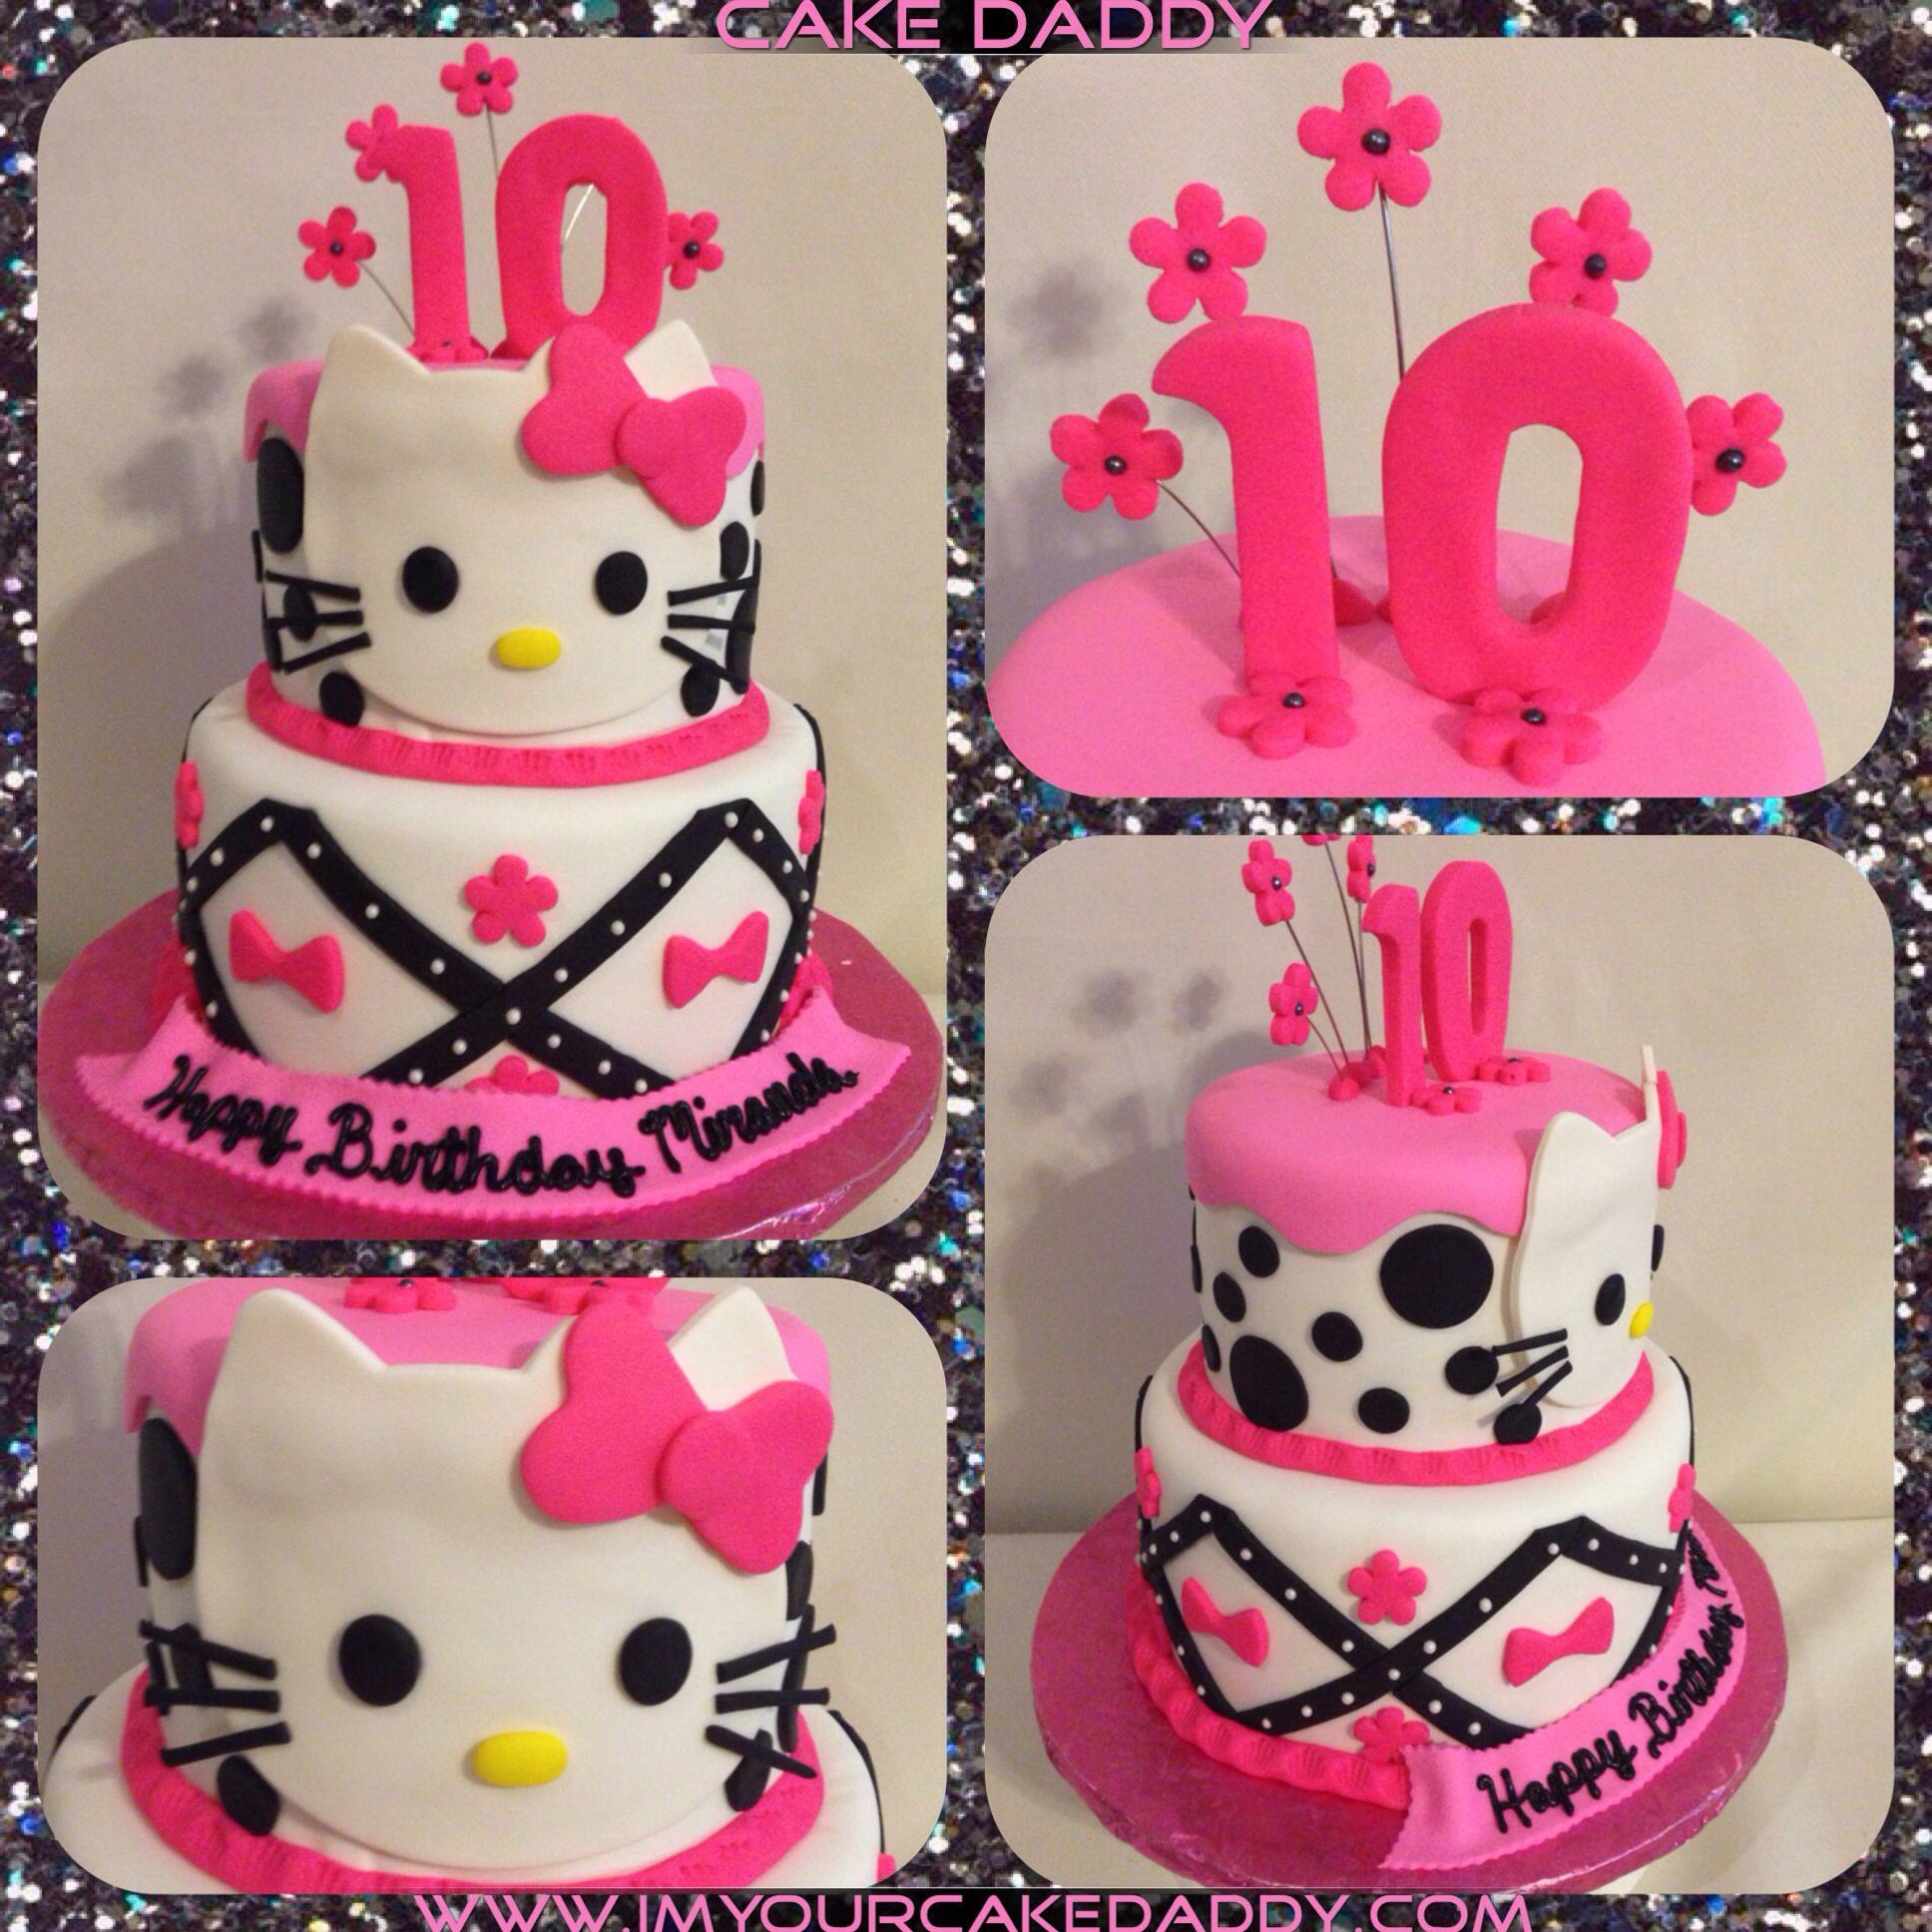 Hello Kitty 2 Tiered Birthday Cake Custom Cakes by Cake Daddy